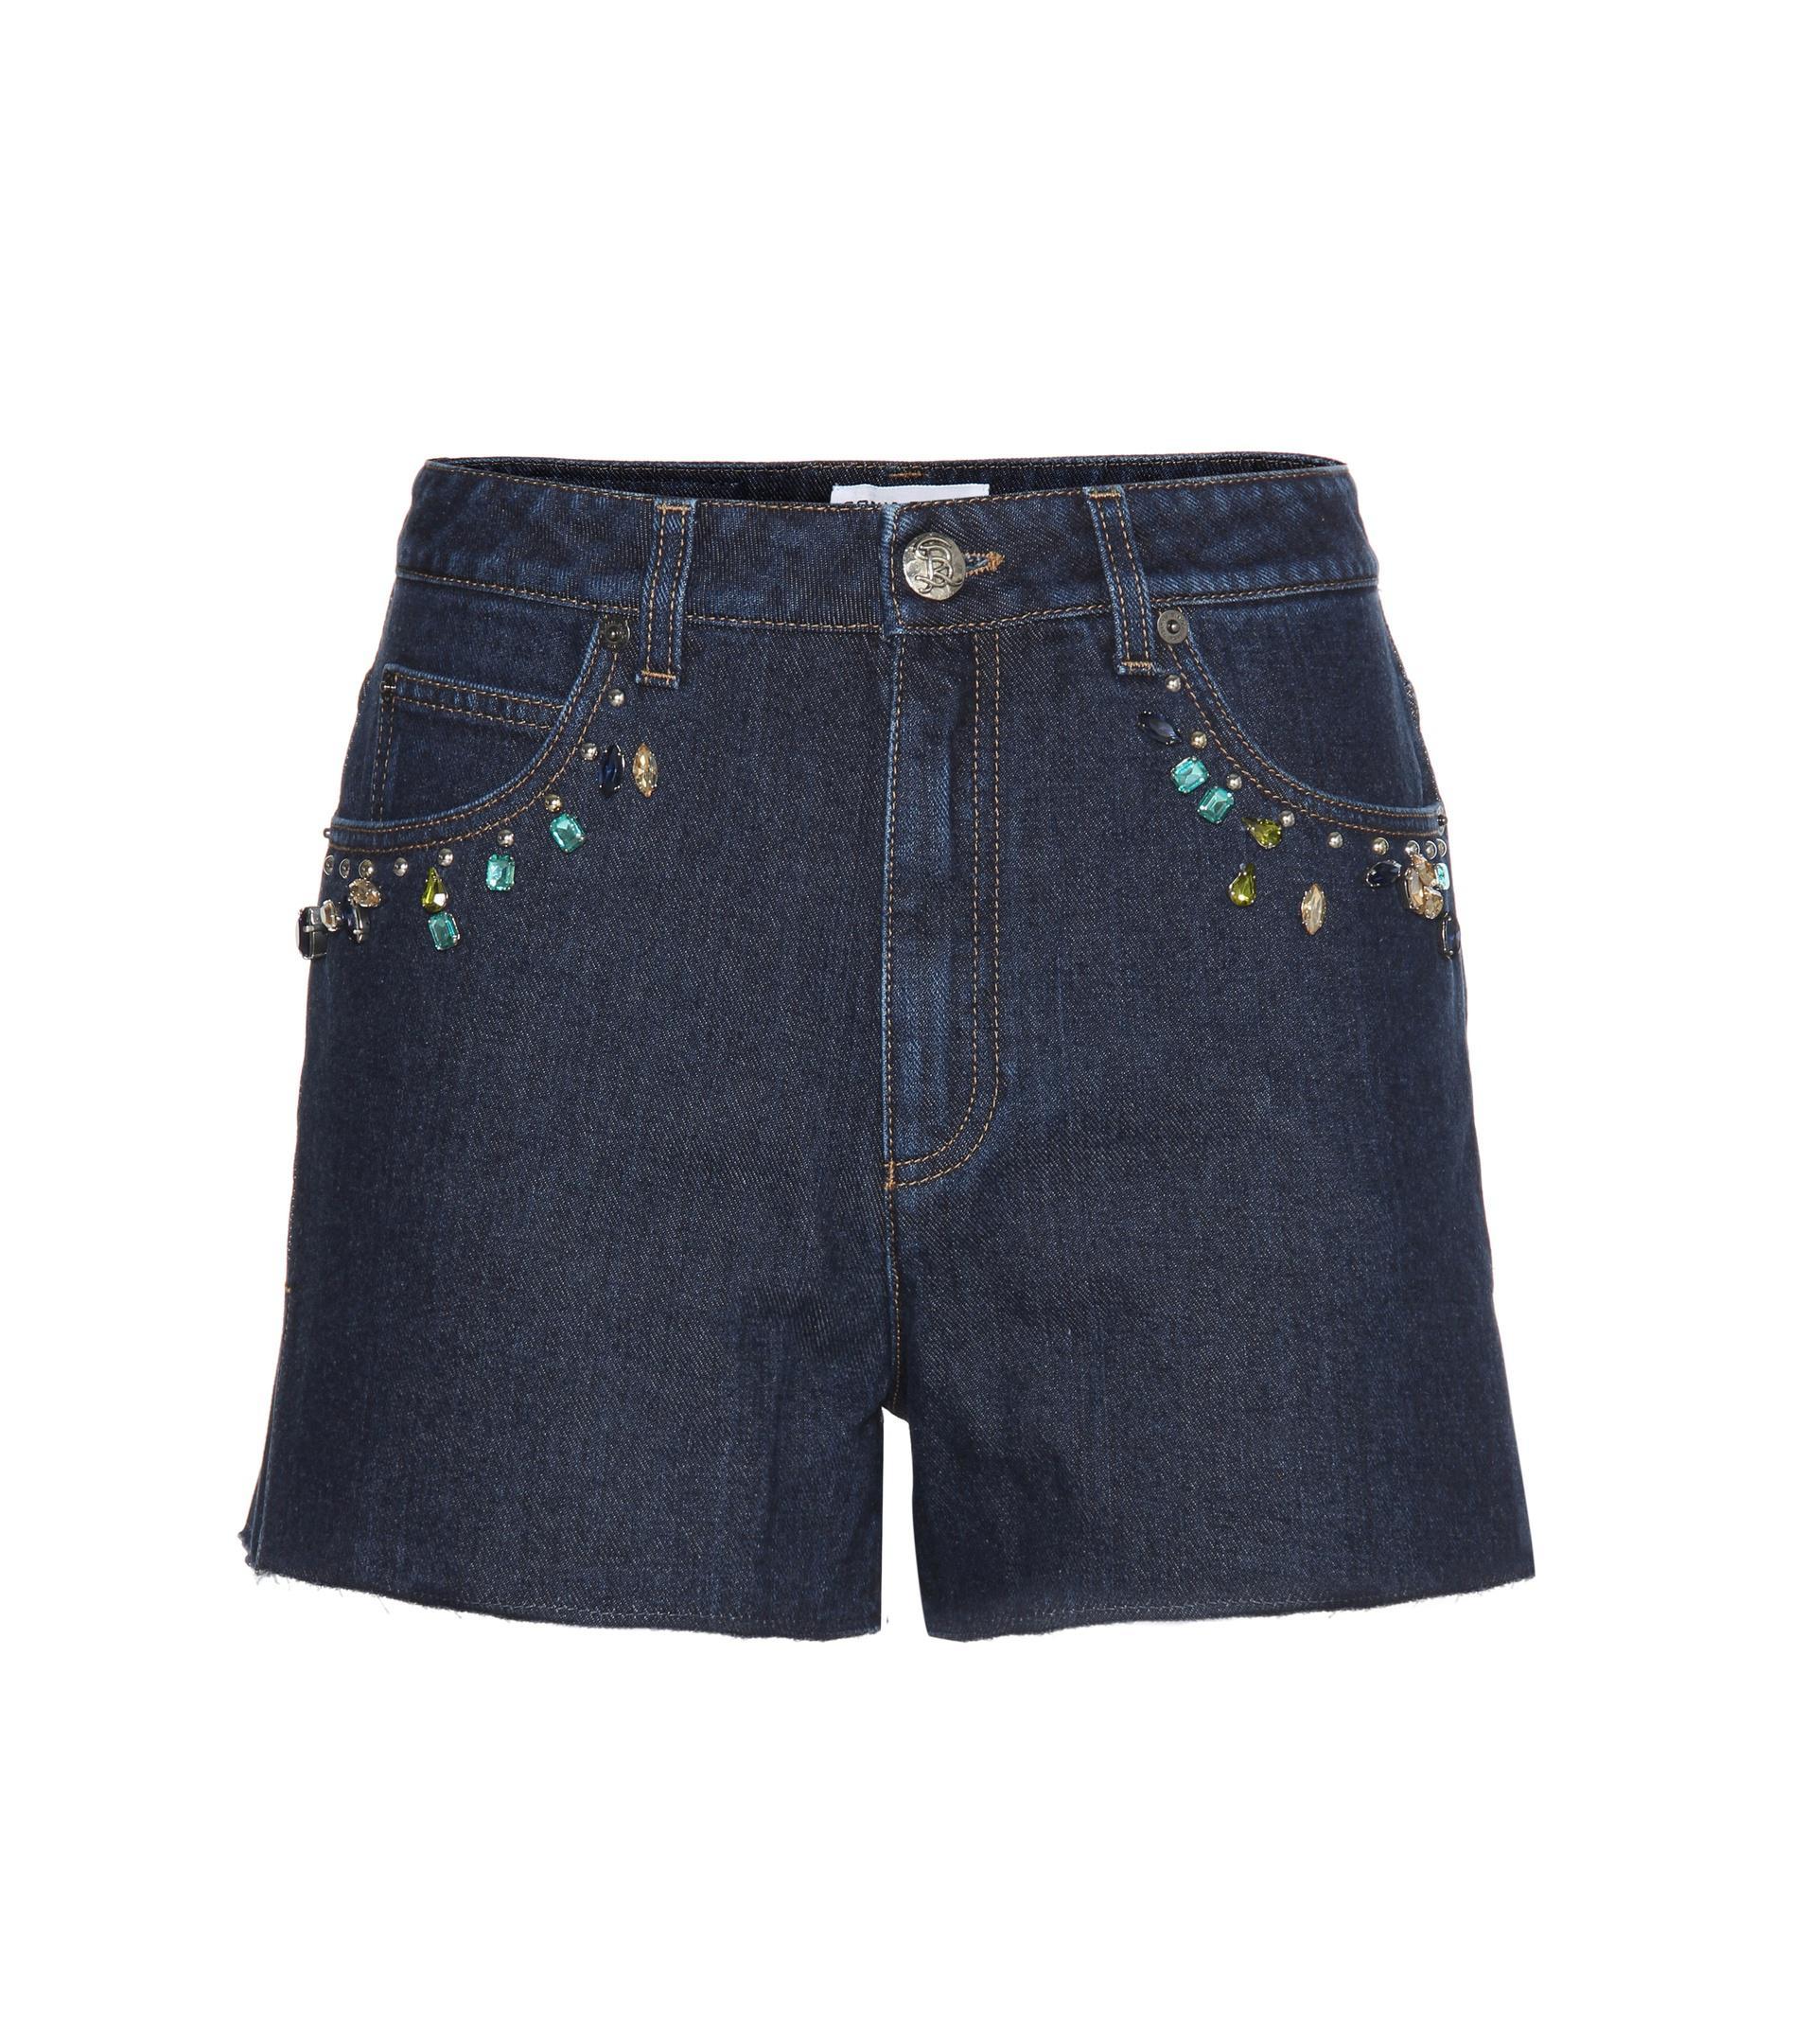 Embellished high-rise denim shorts Sonia Rykiel QNRpUJZ3Rw